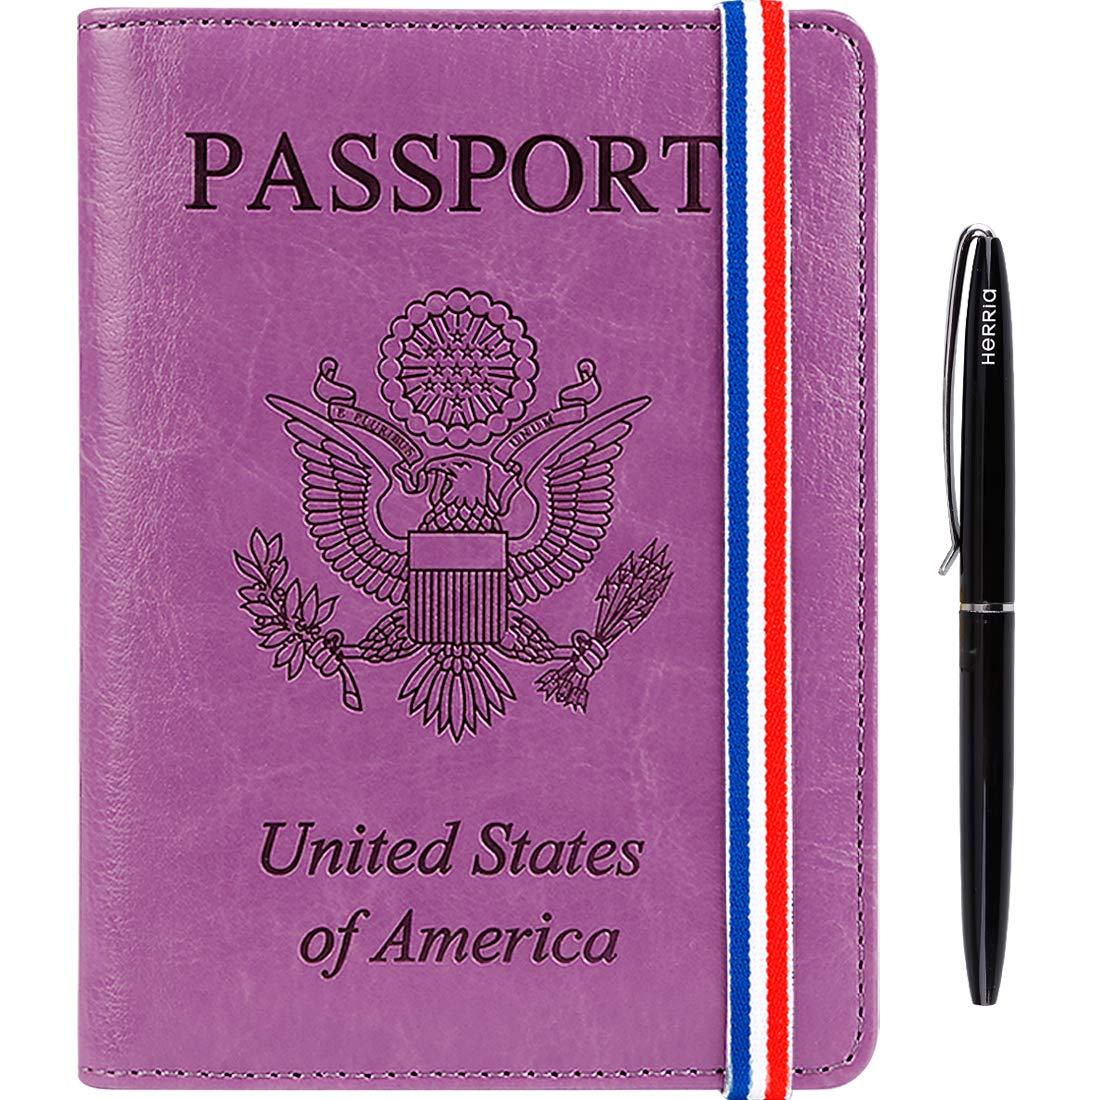 Passport Holder Cover wallet Case-Leather RFID Blocking Travel Document Organizer with Bonus Pen for women men(Medium Orchid)